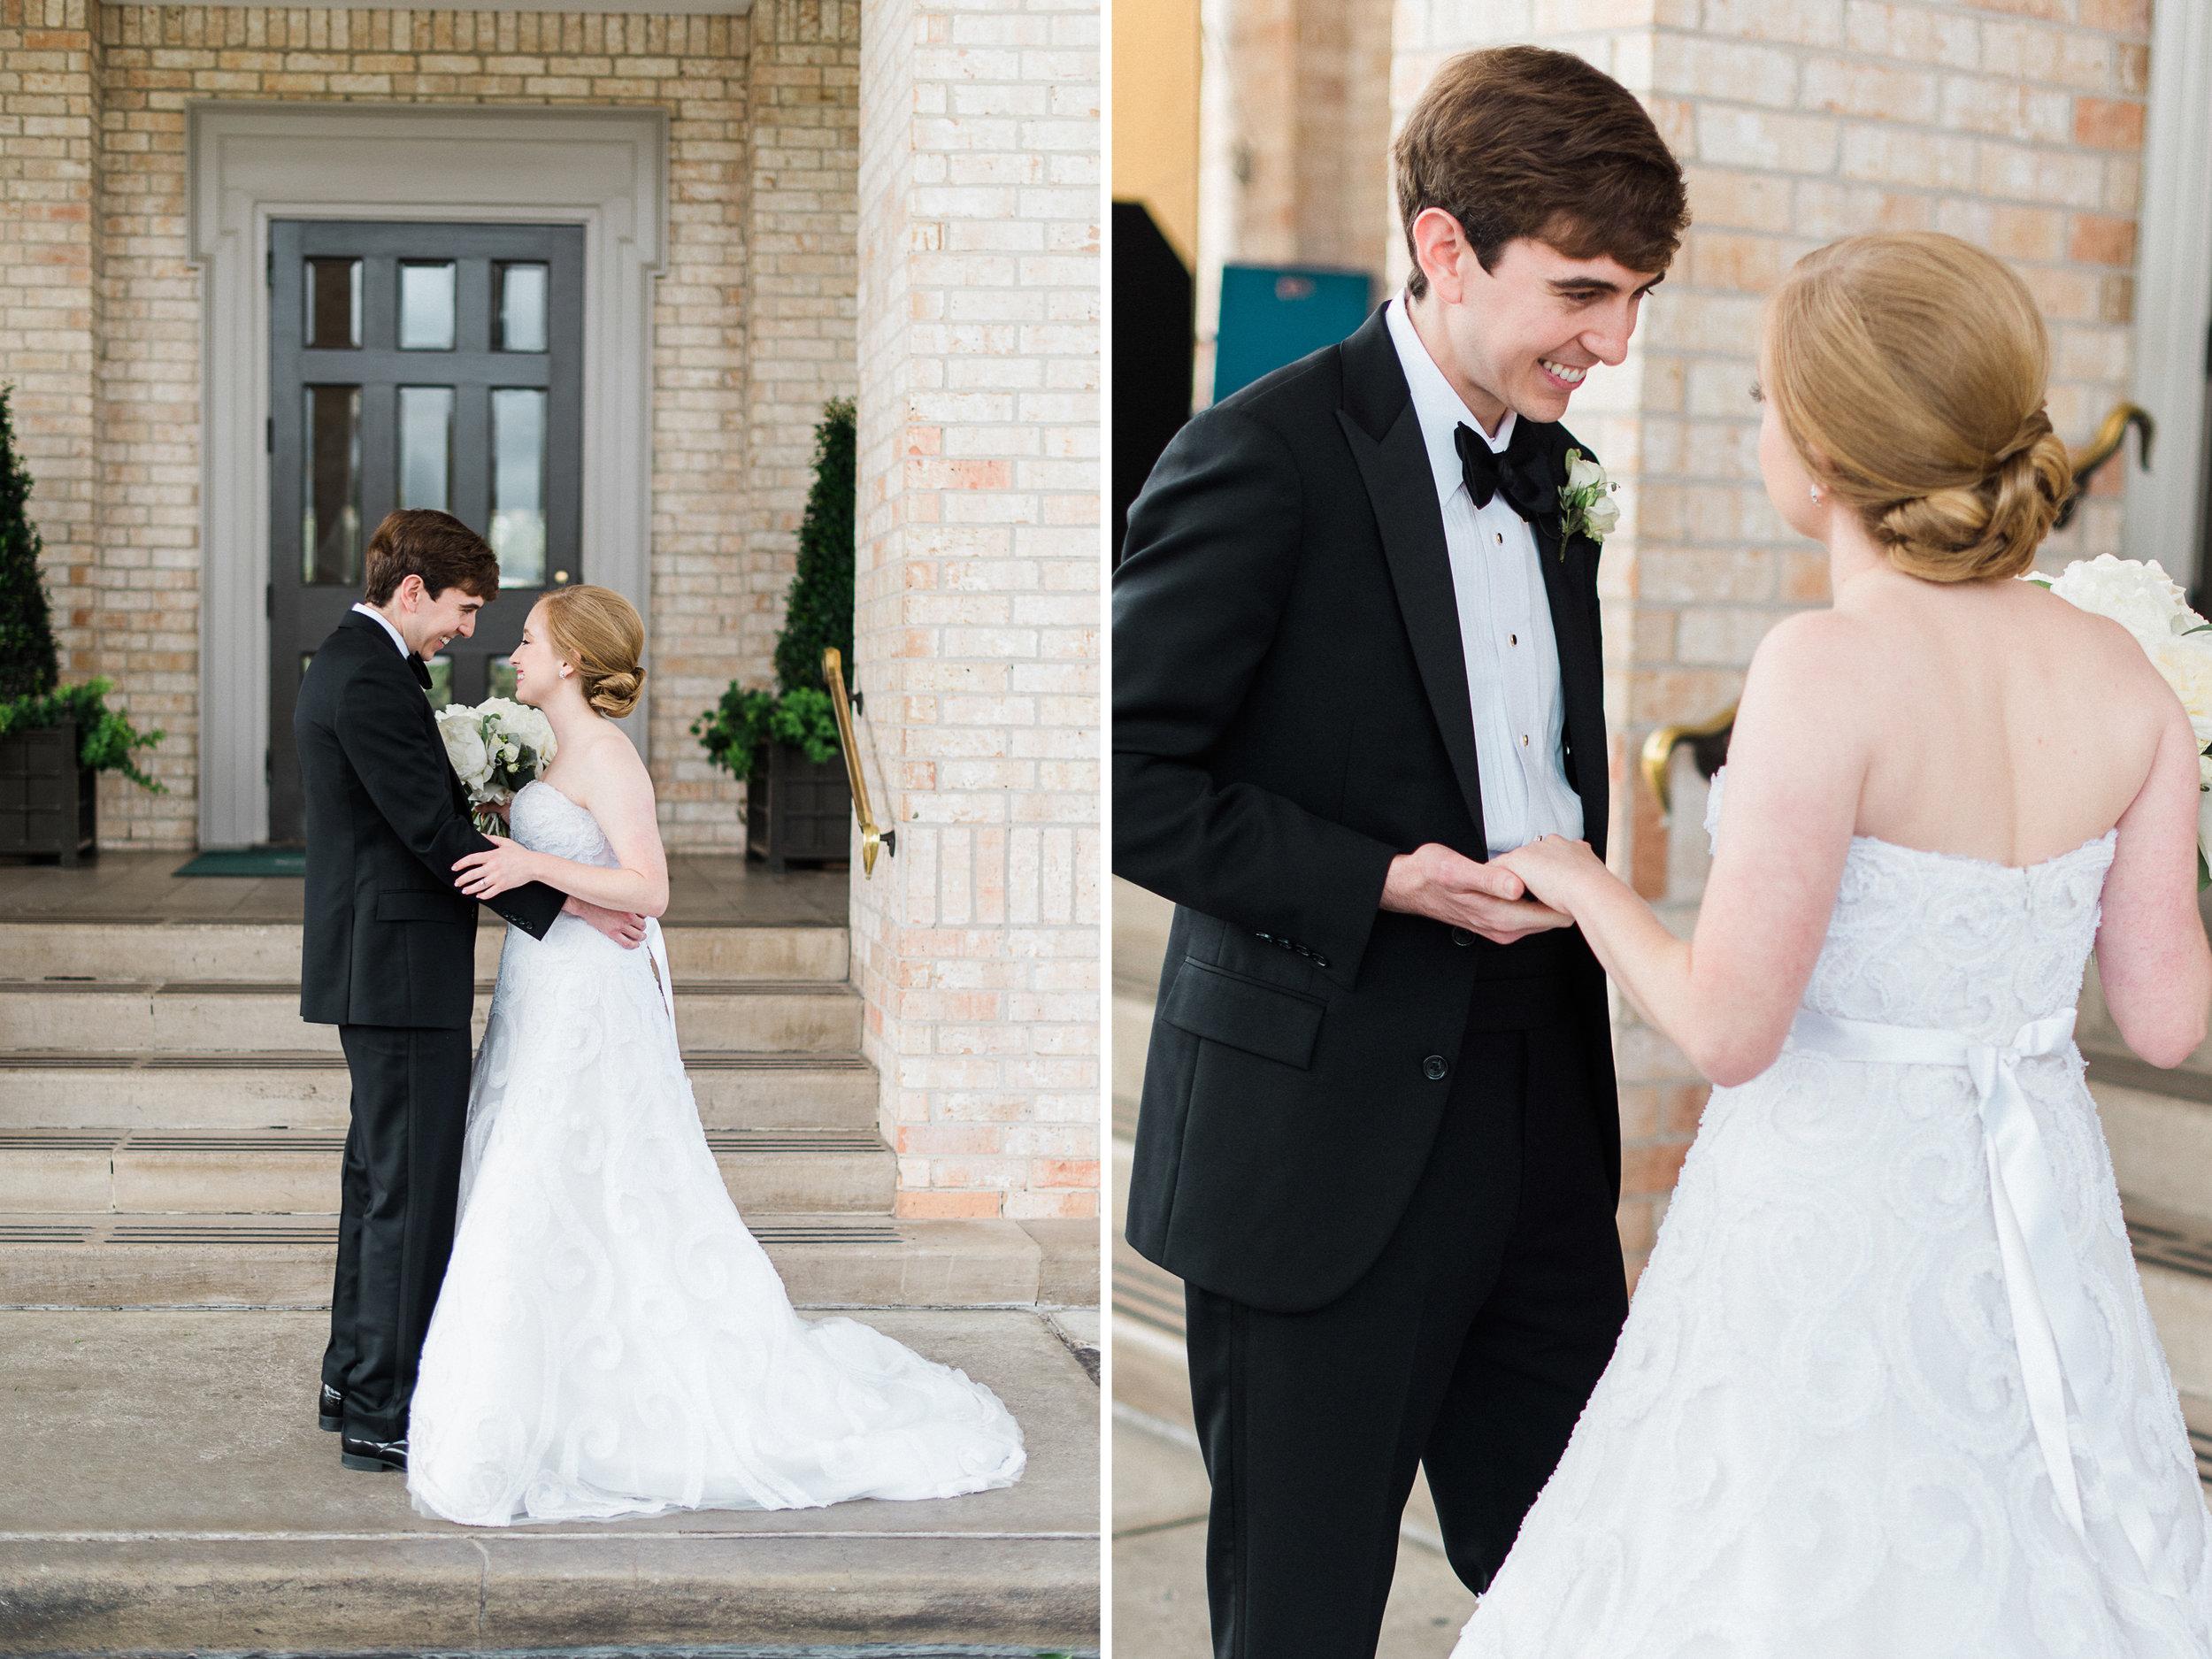 Fine-Art-Film-Houston-Wedding-Photographer-Best-Top-Luxury-Texas-Austin-Dallas-Destination-Dana-Fernandez-Photography-River-Oaks-Country-Club-South-Main-Baptist-Ceremony-Reception-Wedding-122.jpg